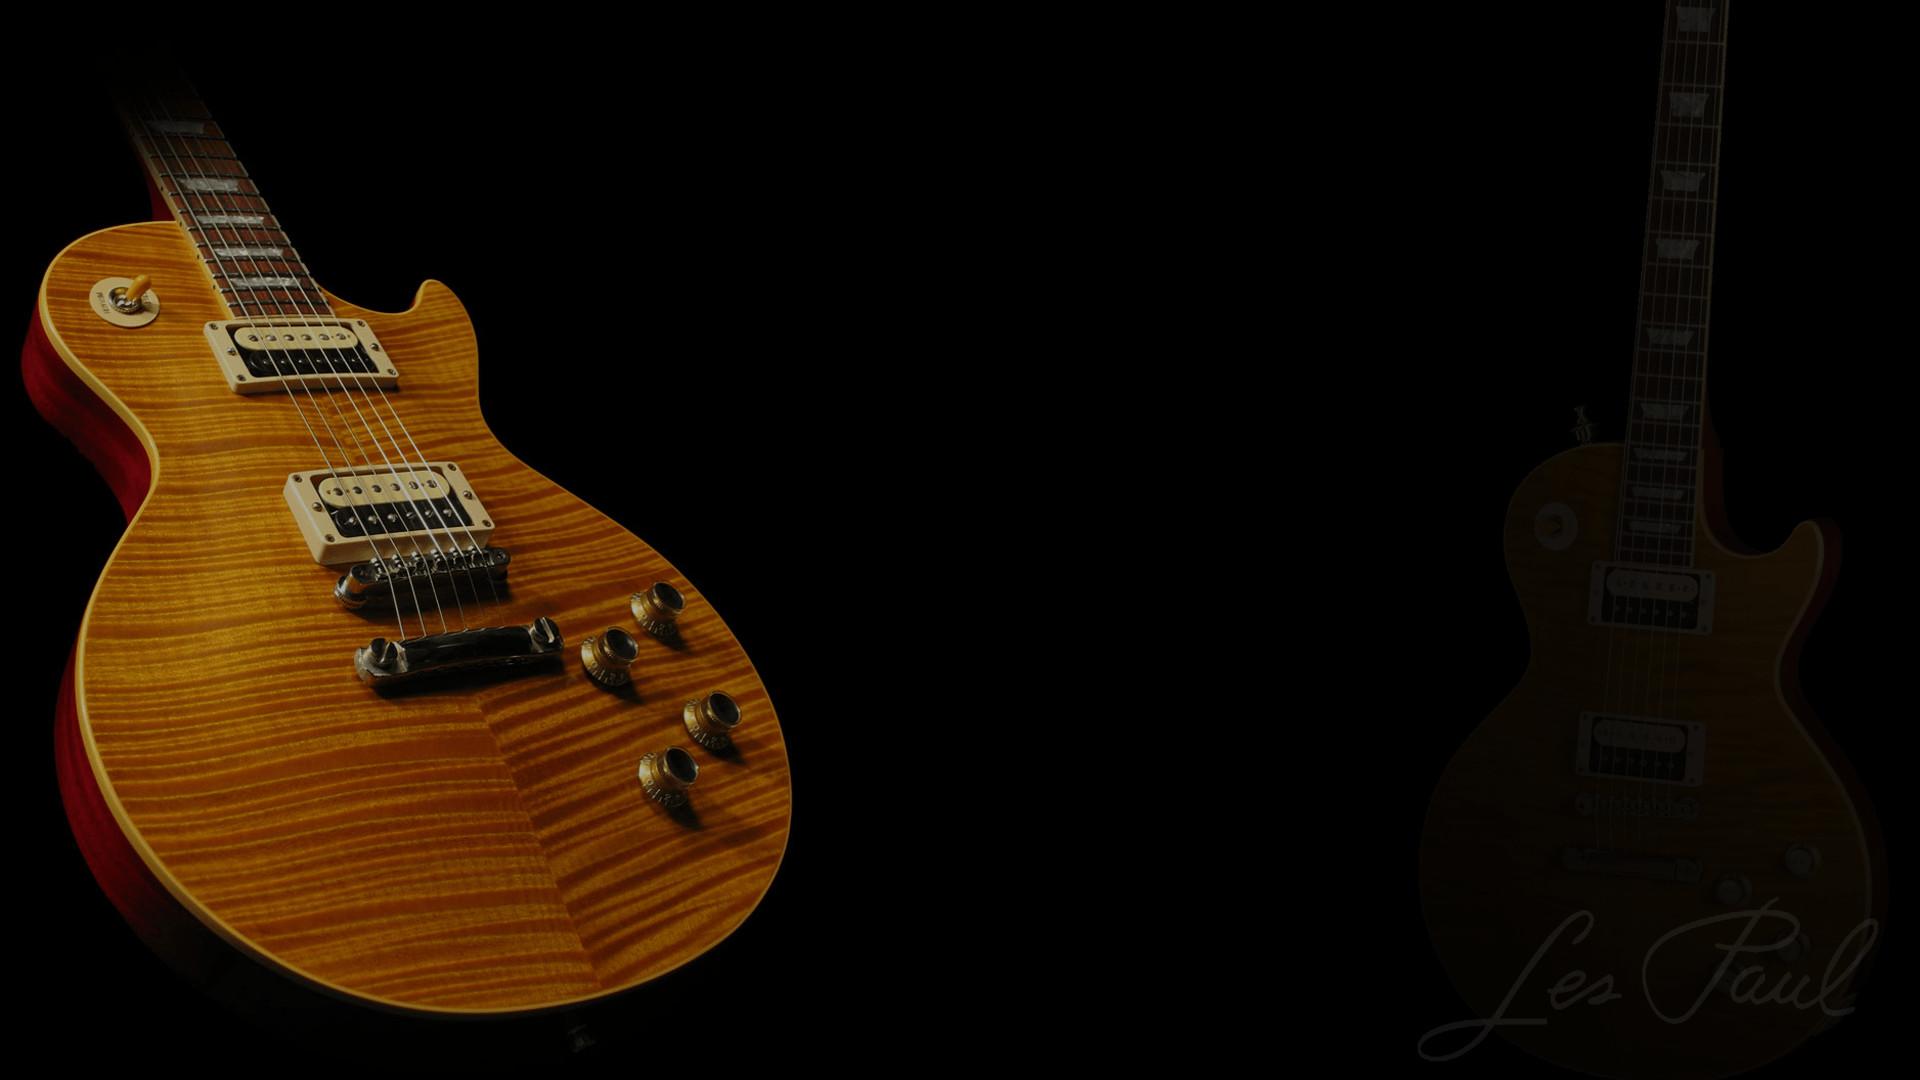 Guitar Gibson Les Paul Wallpaper | High Definition Wallpapers .